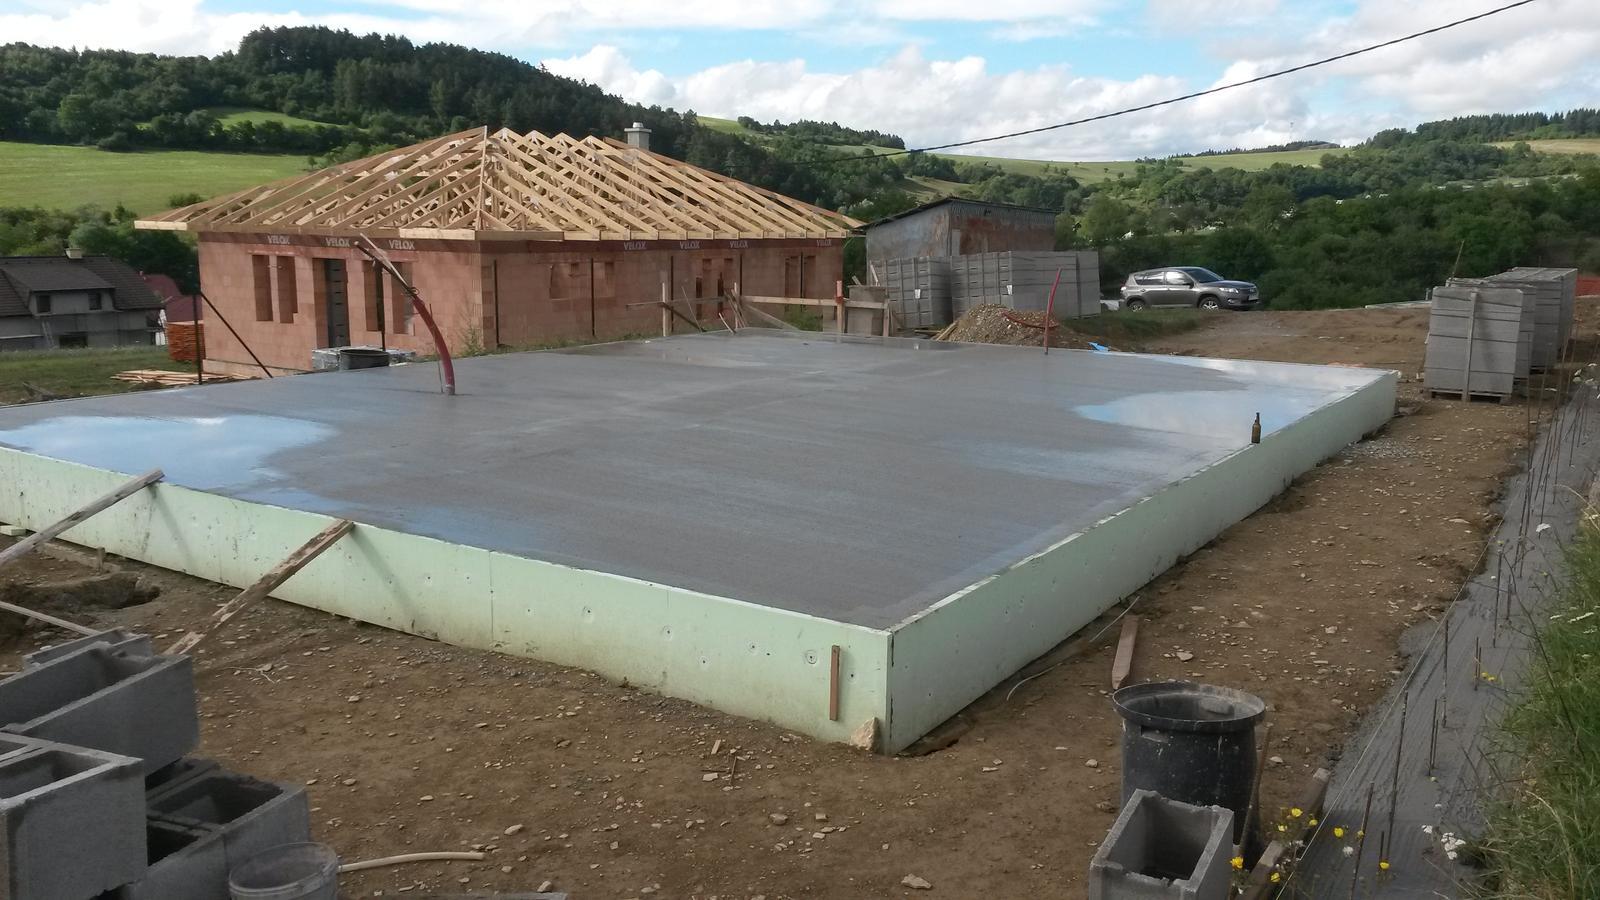 Dom - 13x10m  (15cm hrubka) cca 17-19m3 betonu.